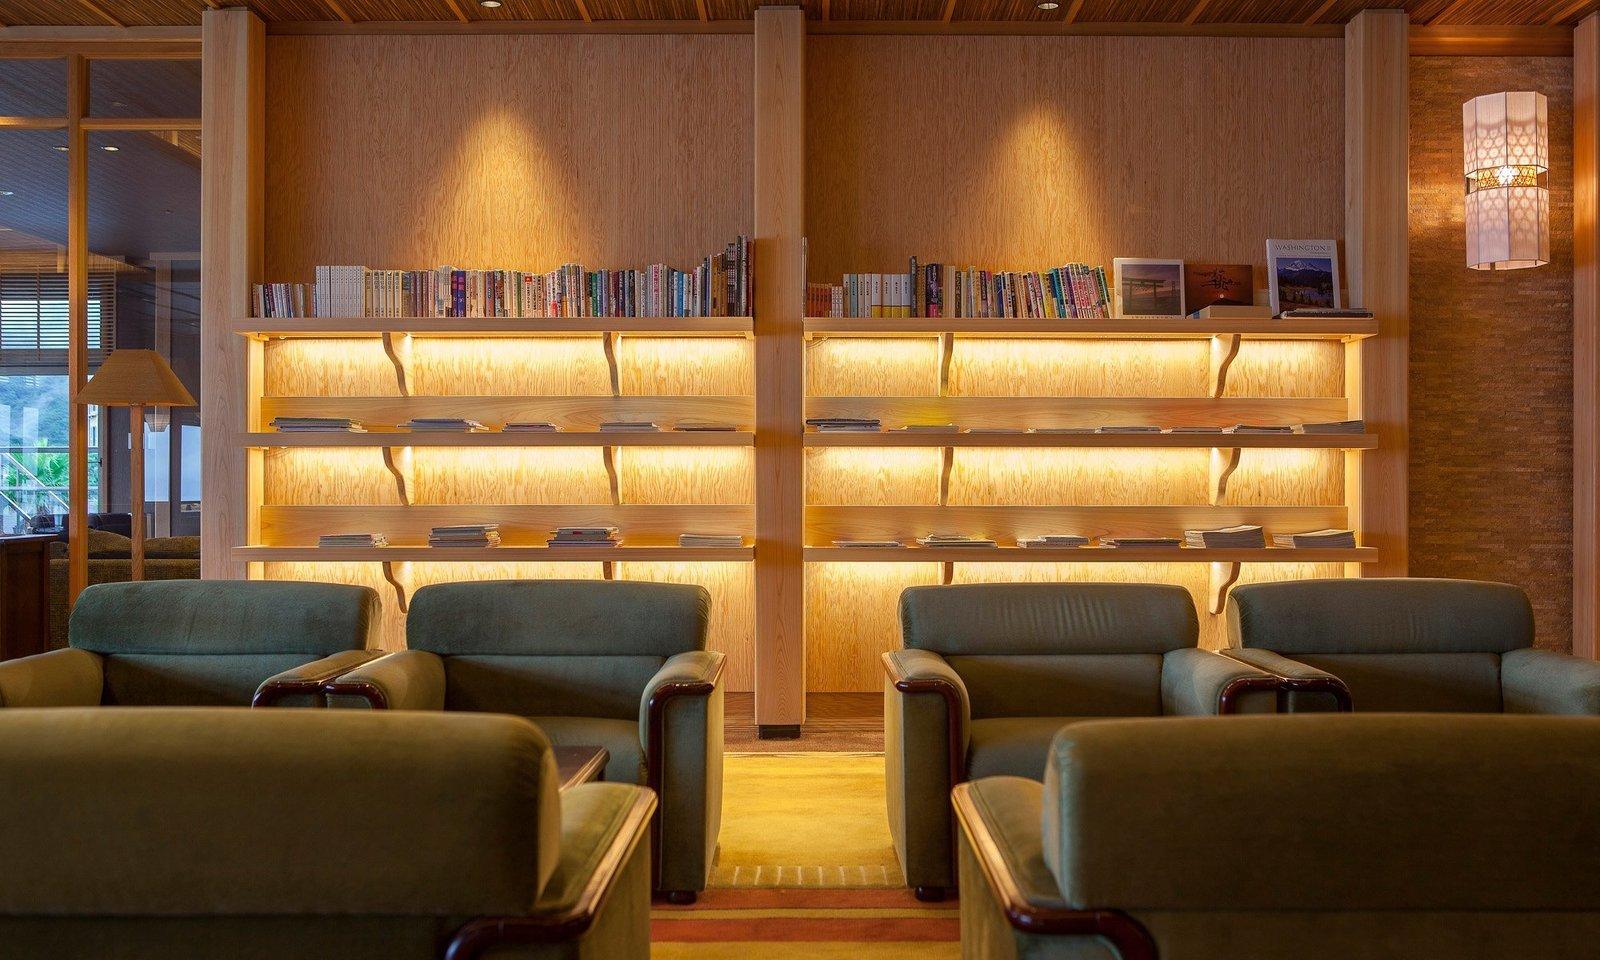 Living Room, Accent Lighting, Wall Lighting, Chair, Coffee Tables, and Shelves  Villa Rakuen